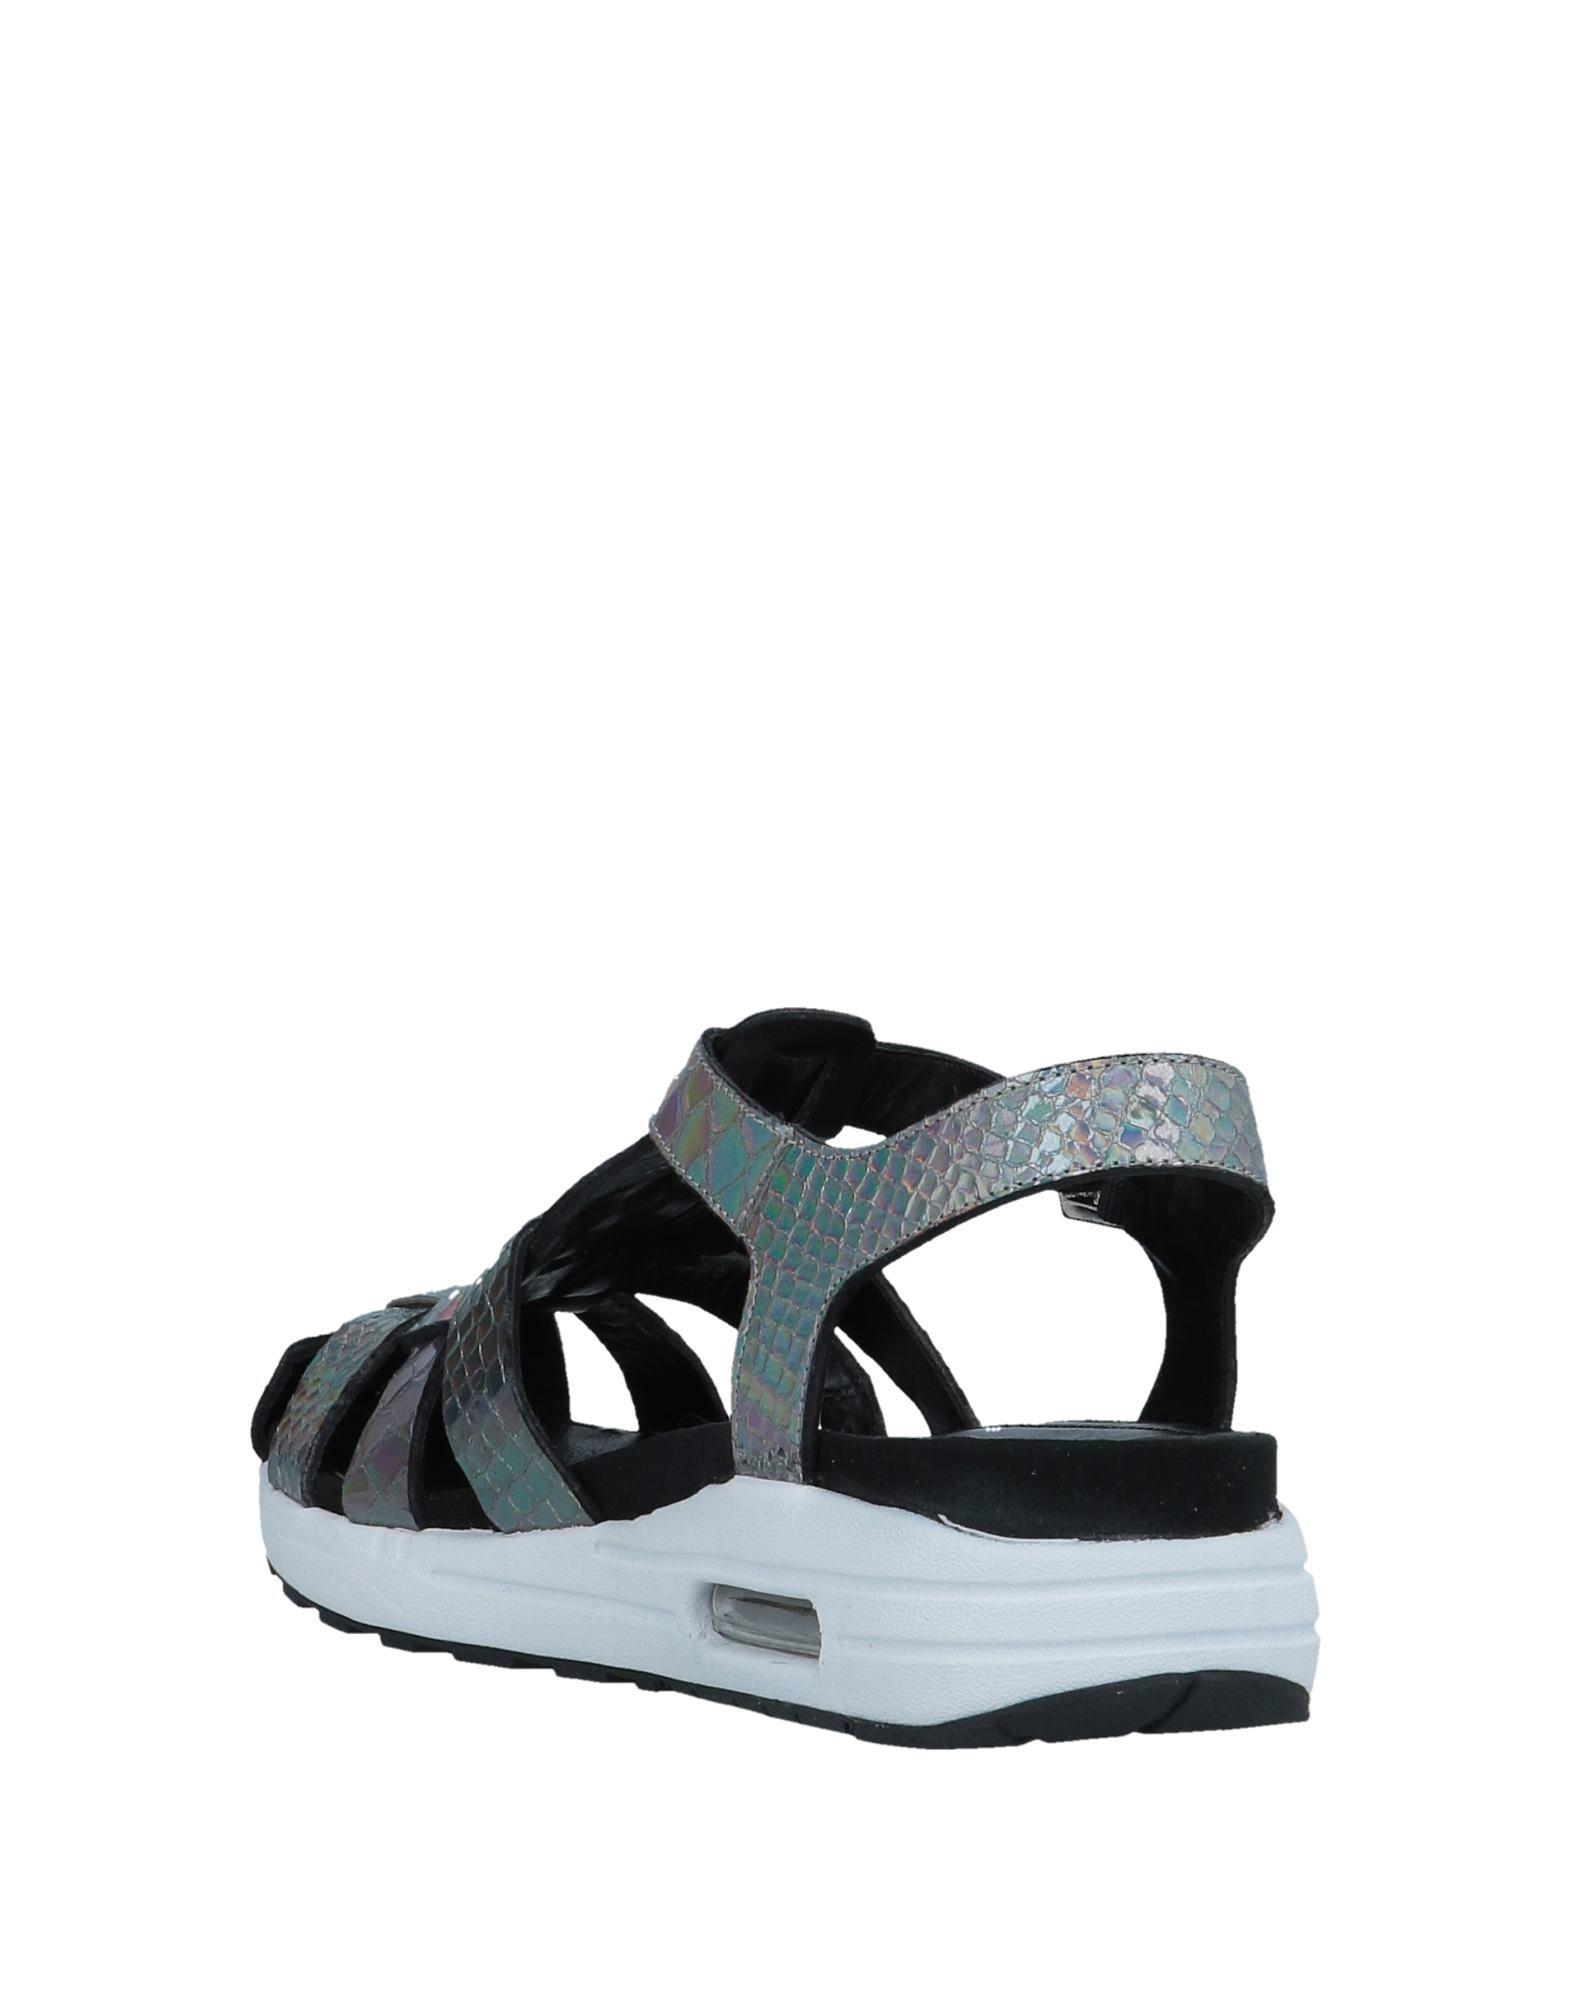 Stilvolle billige Schuhe Susana  Traca Sandalen Damen  Susana 11557661UC f46664